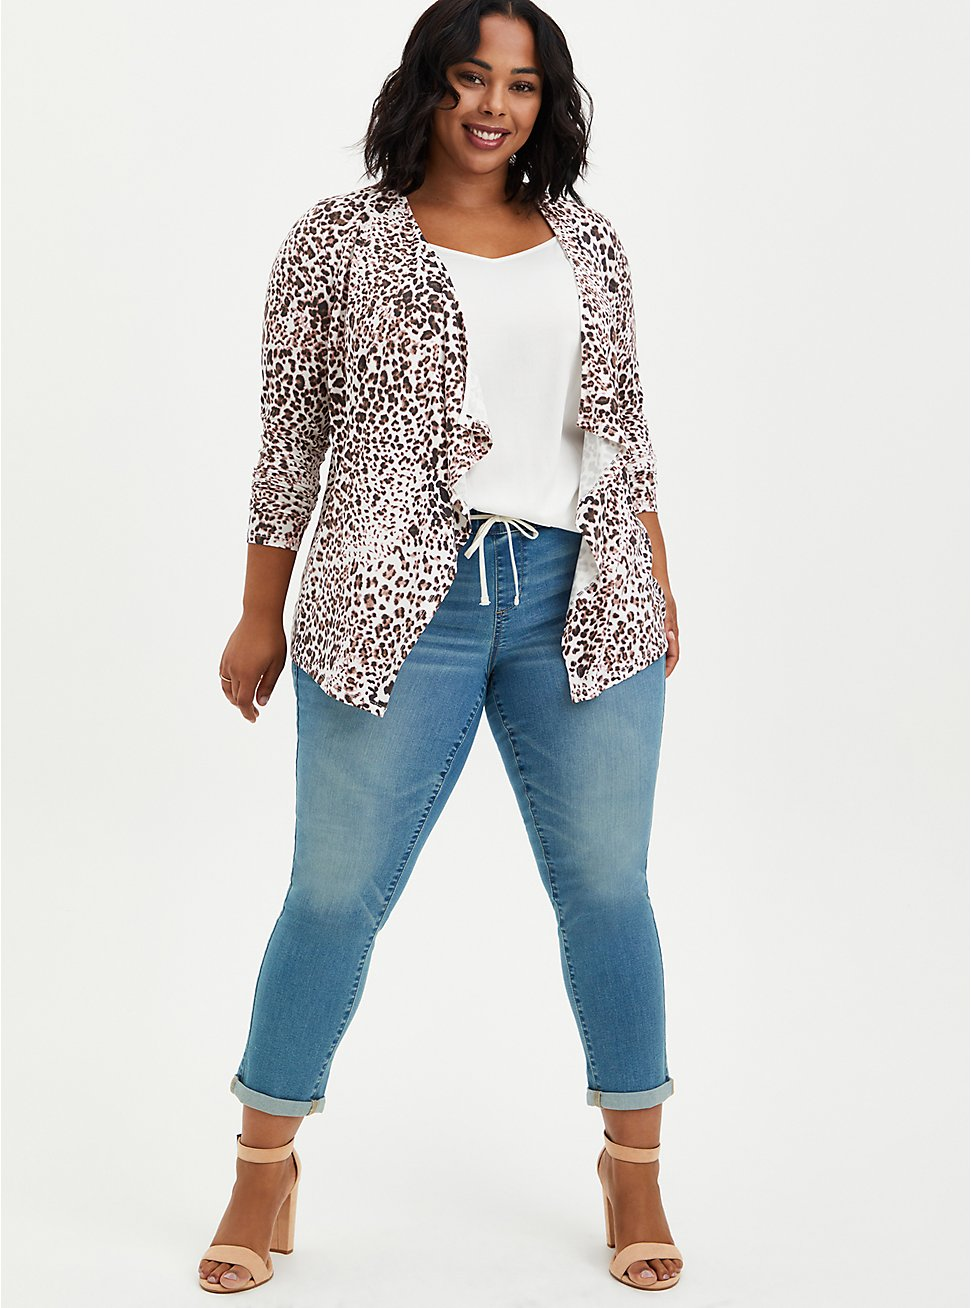 Super Soft Leopard Drape Cardigan Sweater, IKAT - COLORED, hi-res